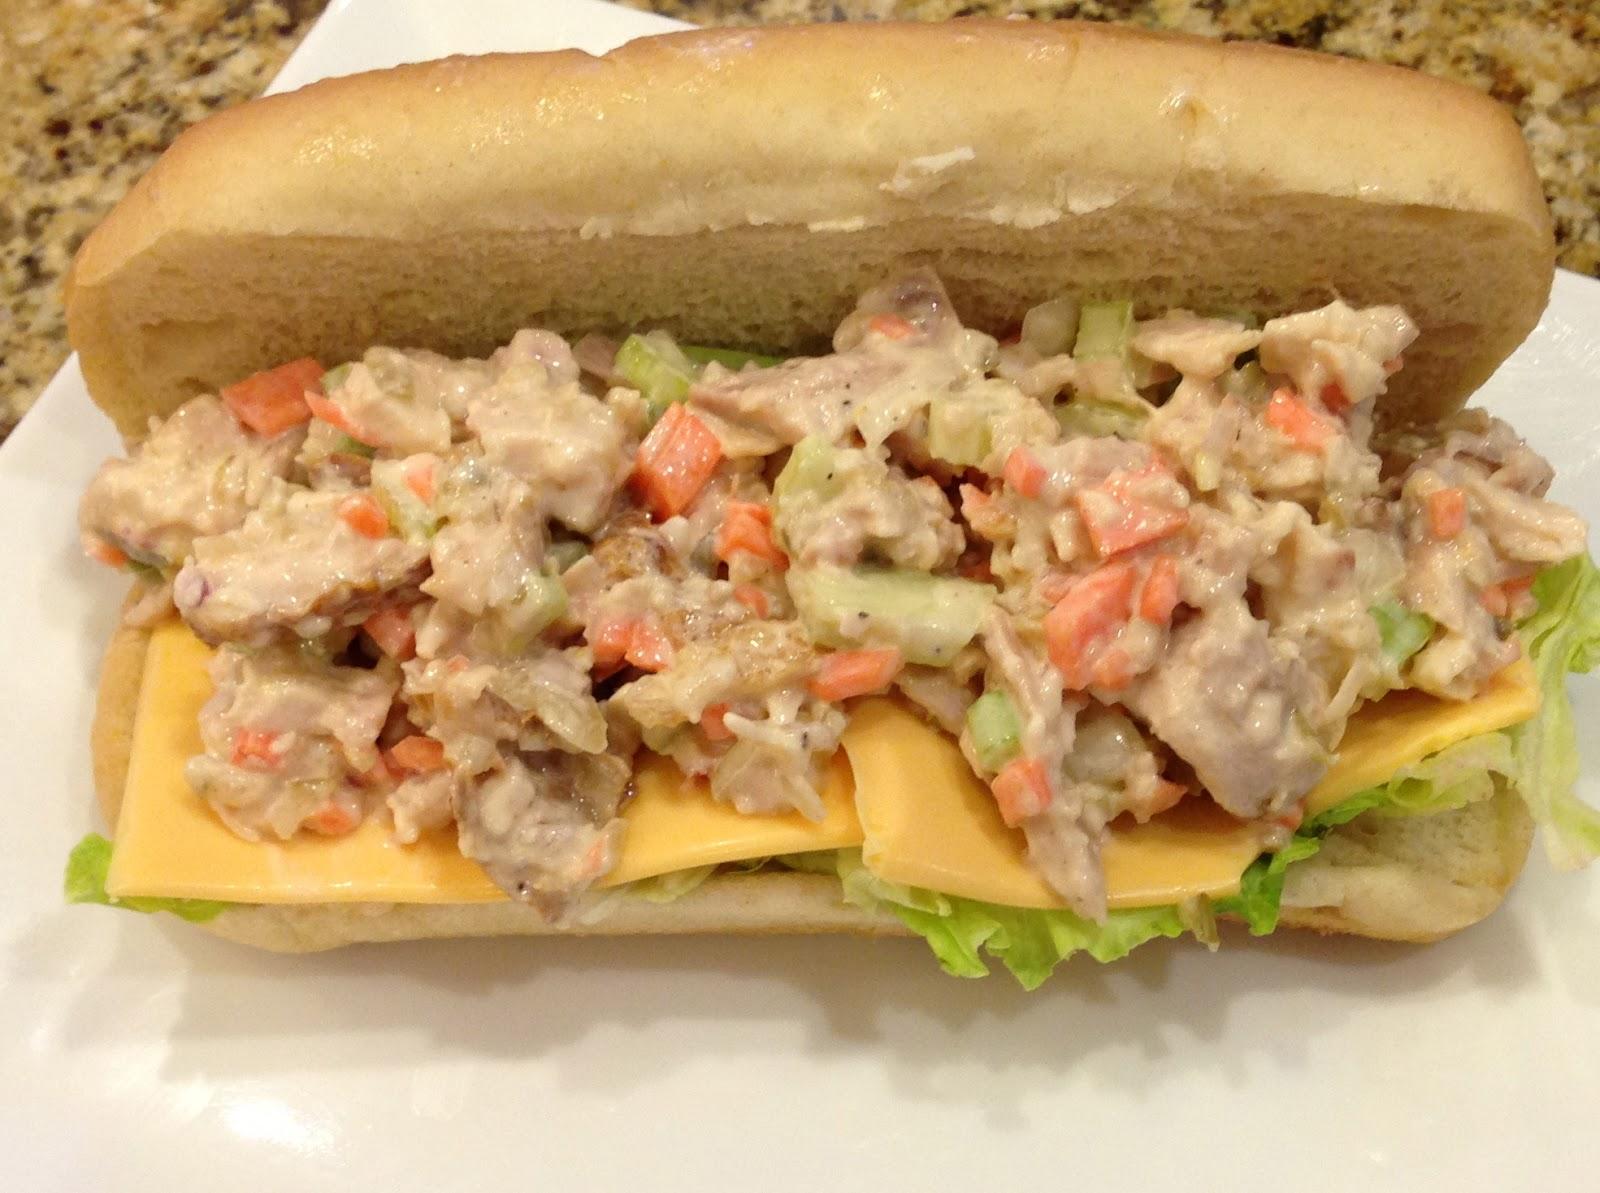 Taste of hawaii world 39 s best tuna sandwich recipe for Best tuna fish recipe